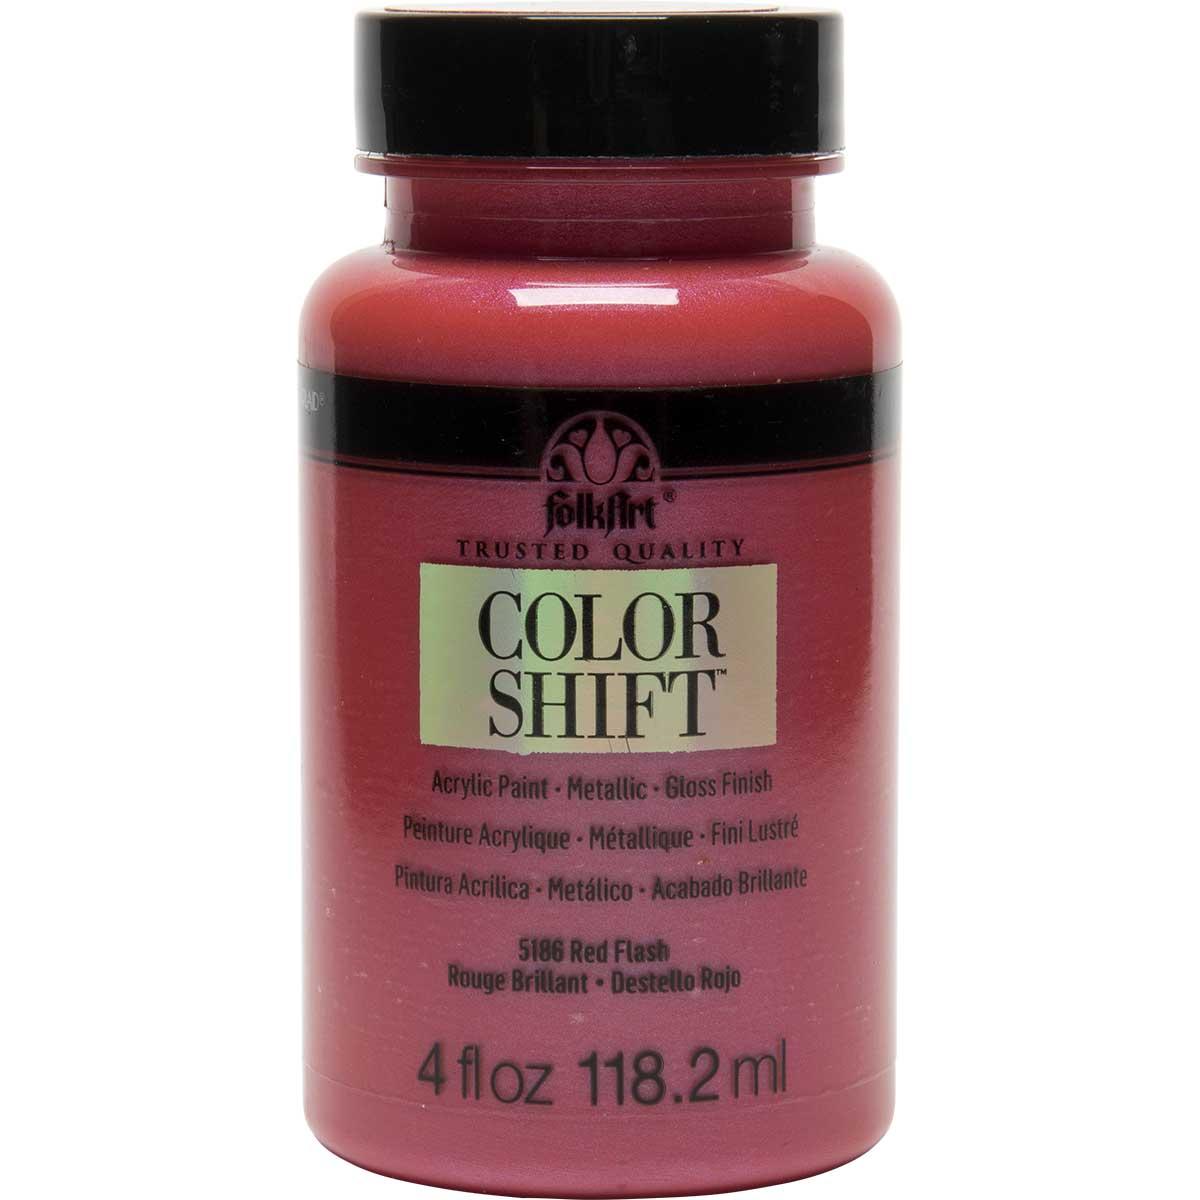 FolkArt ® Color Shift™ Acrylic Paint - Red Flash, 4 oz.